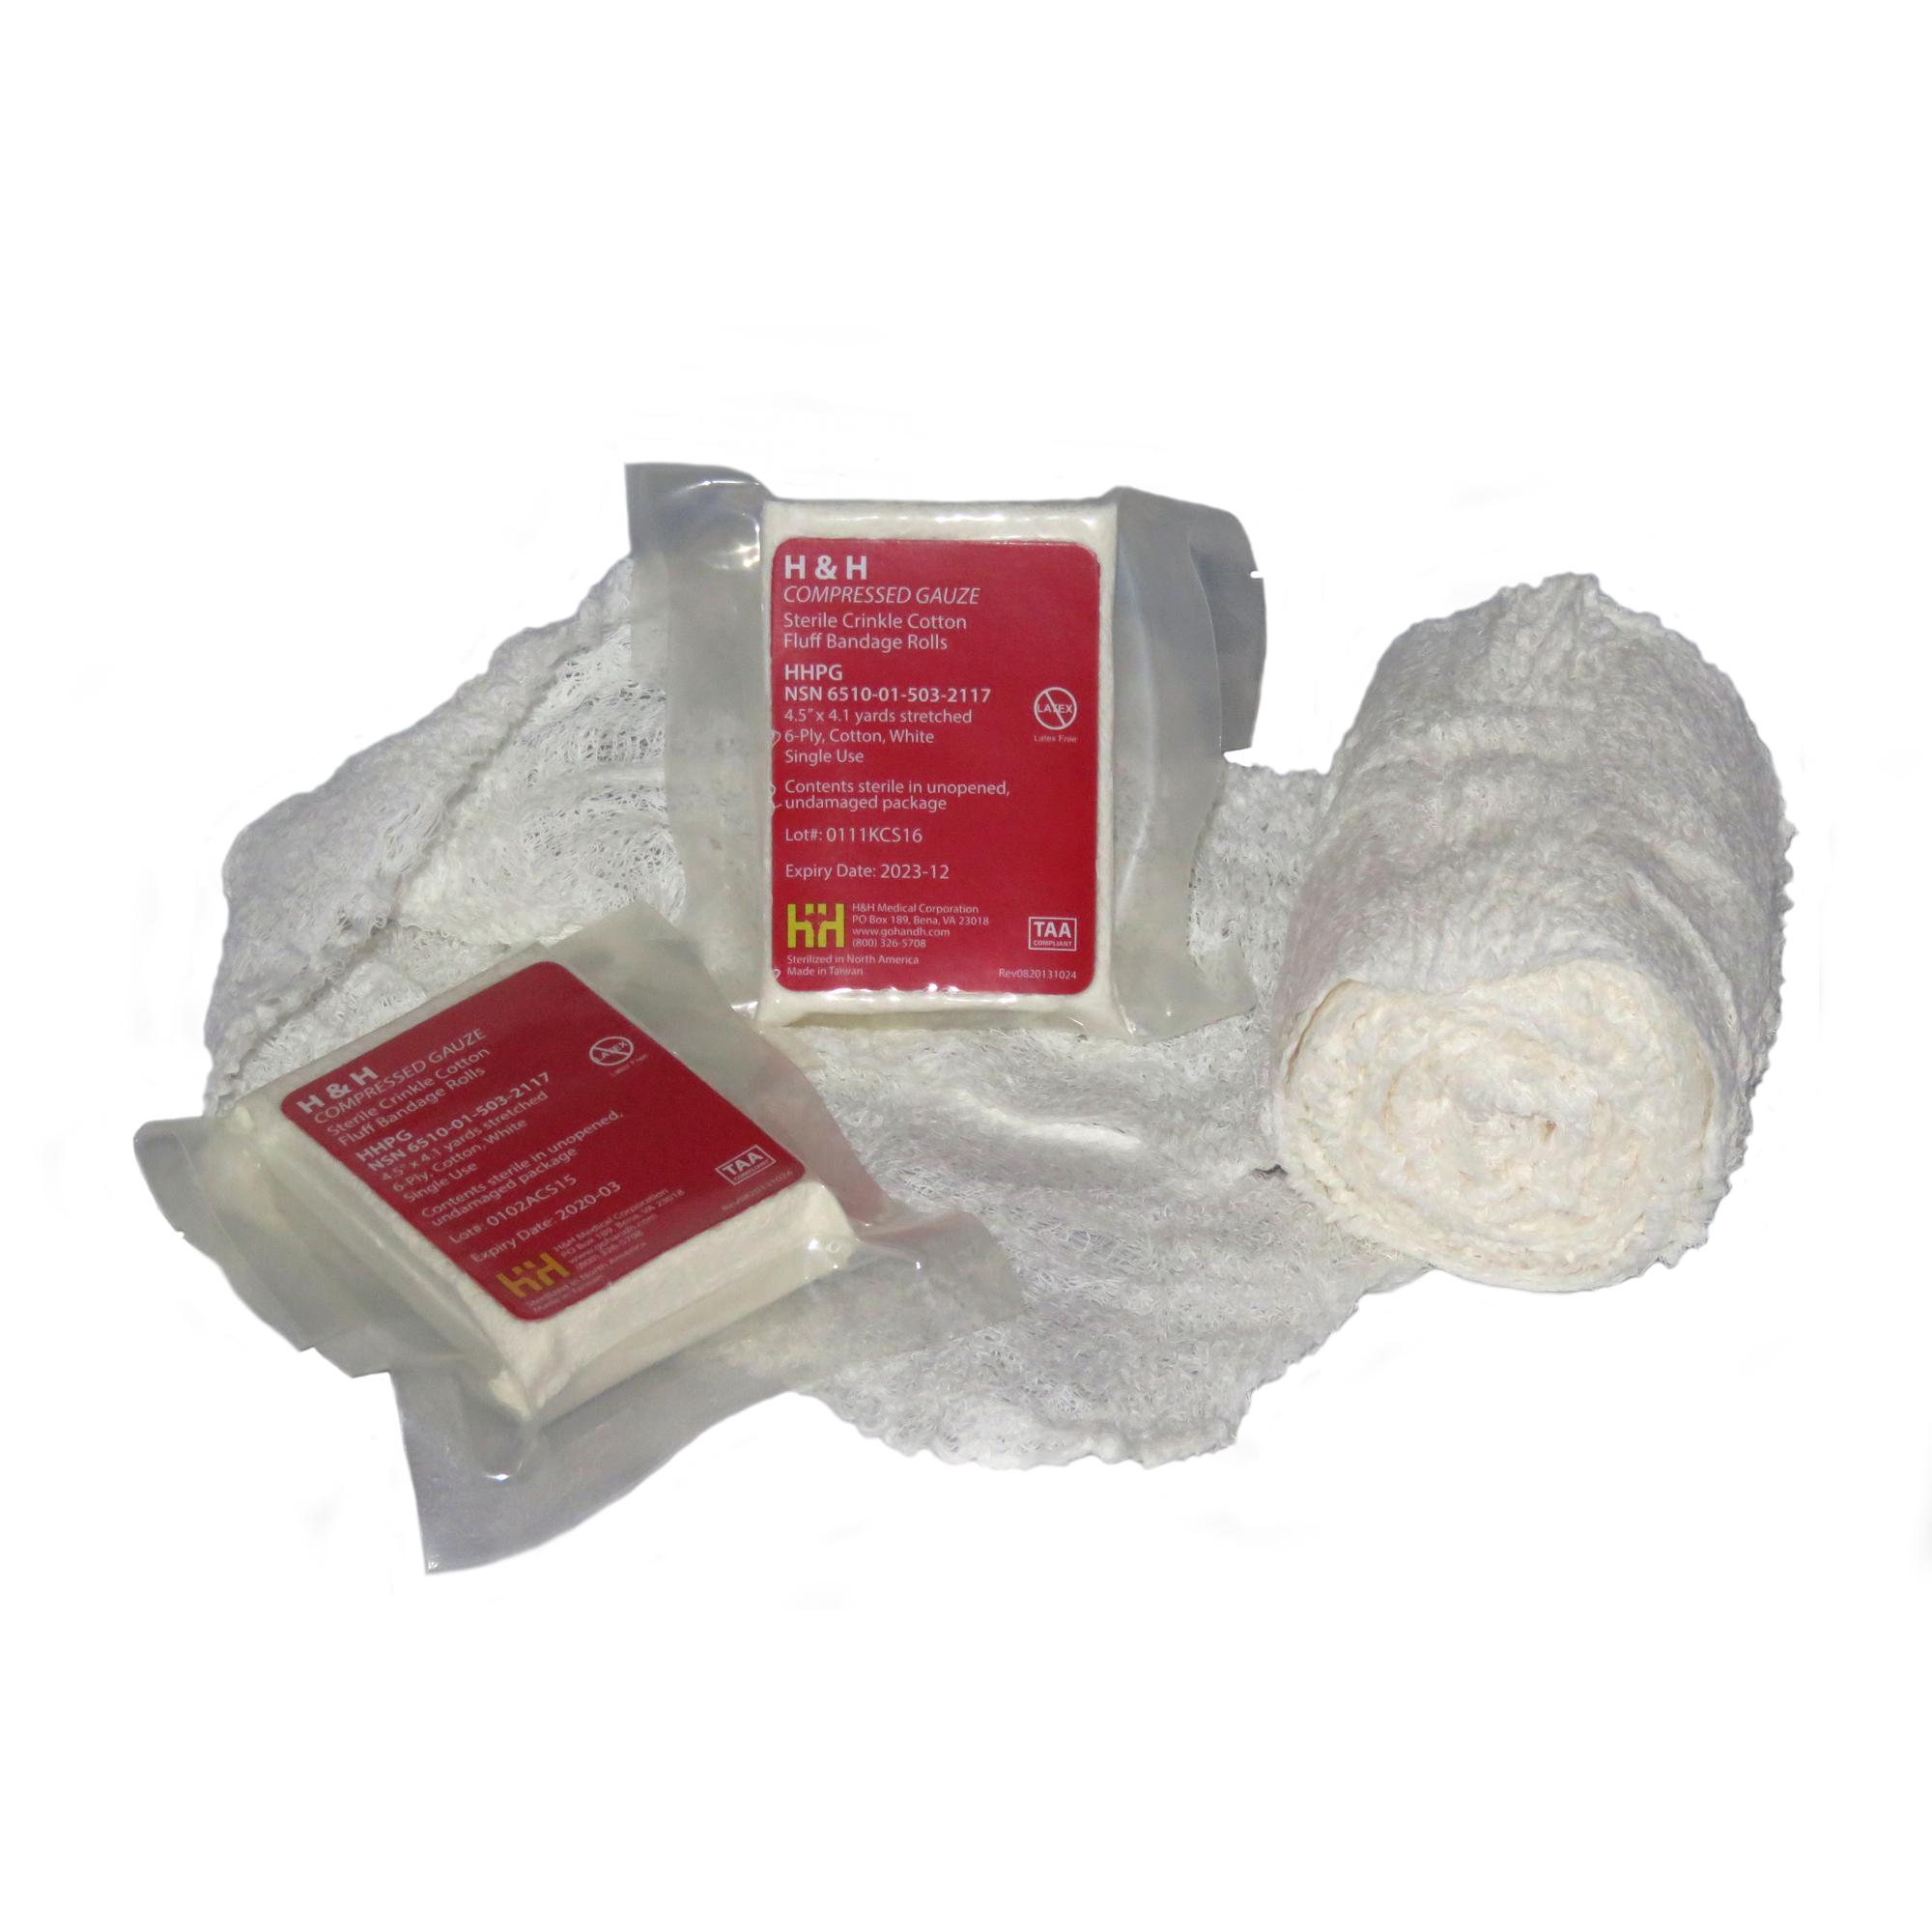 H & H Medical Corporation PriMed Gauze Bandage